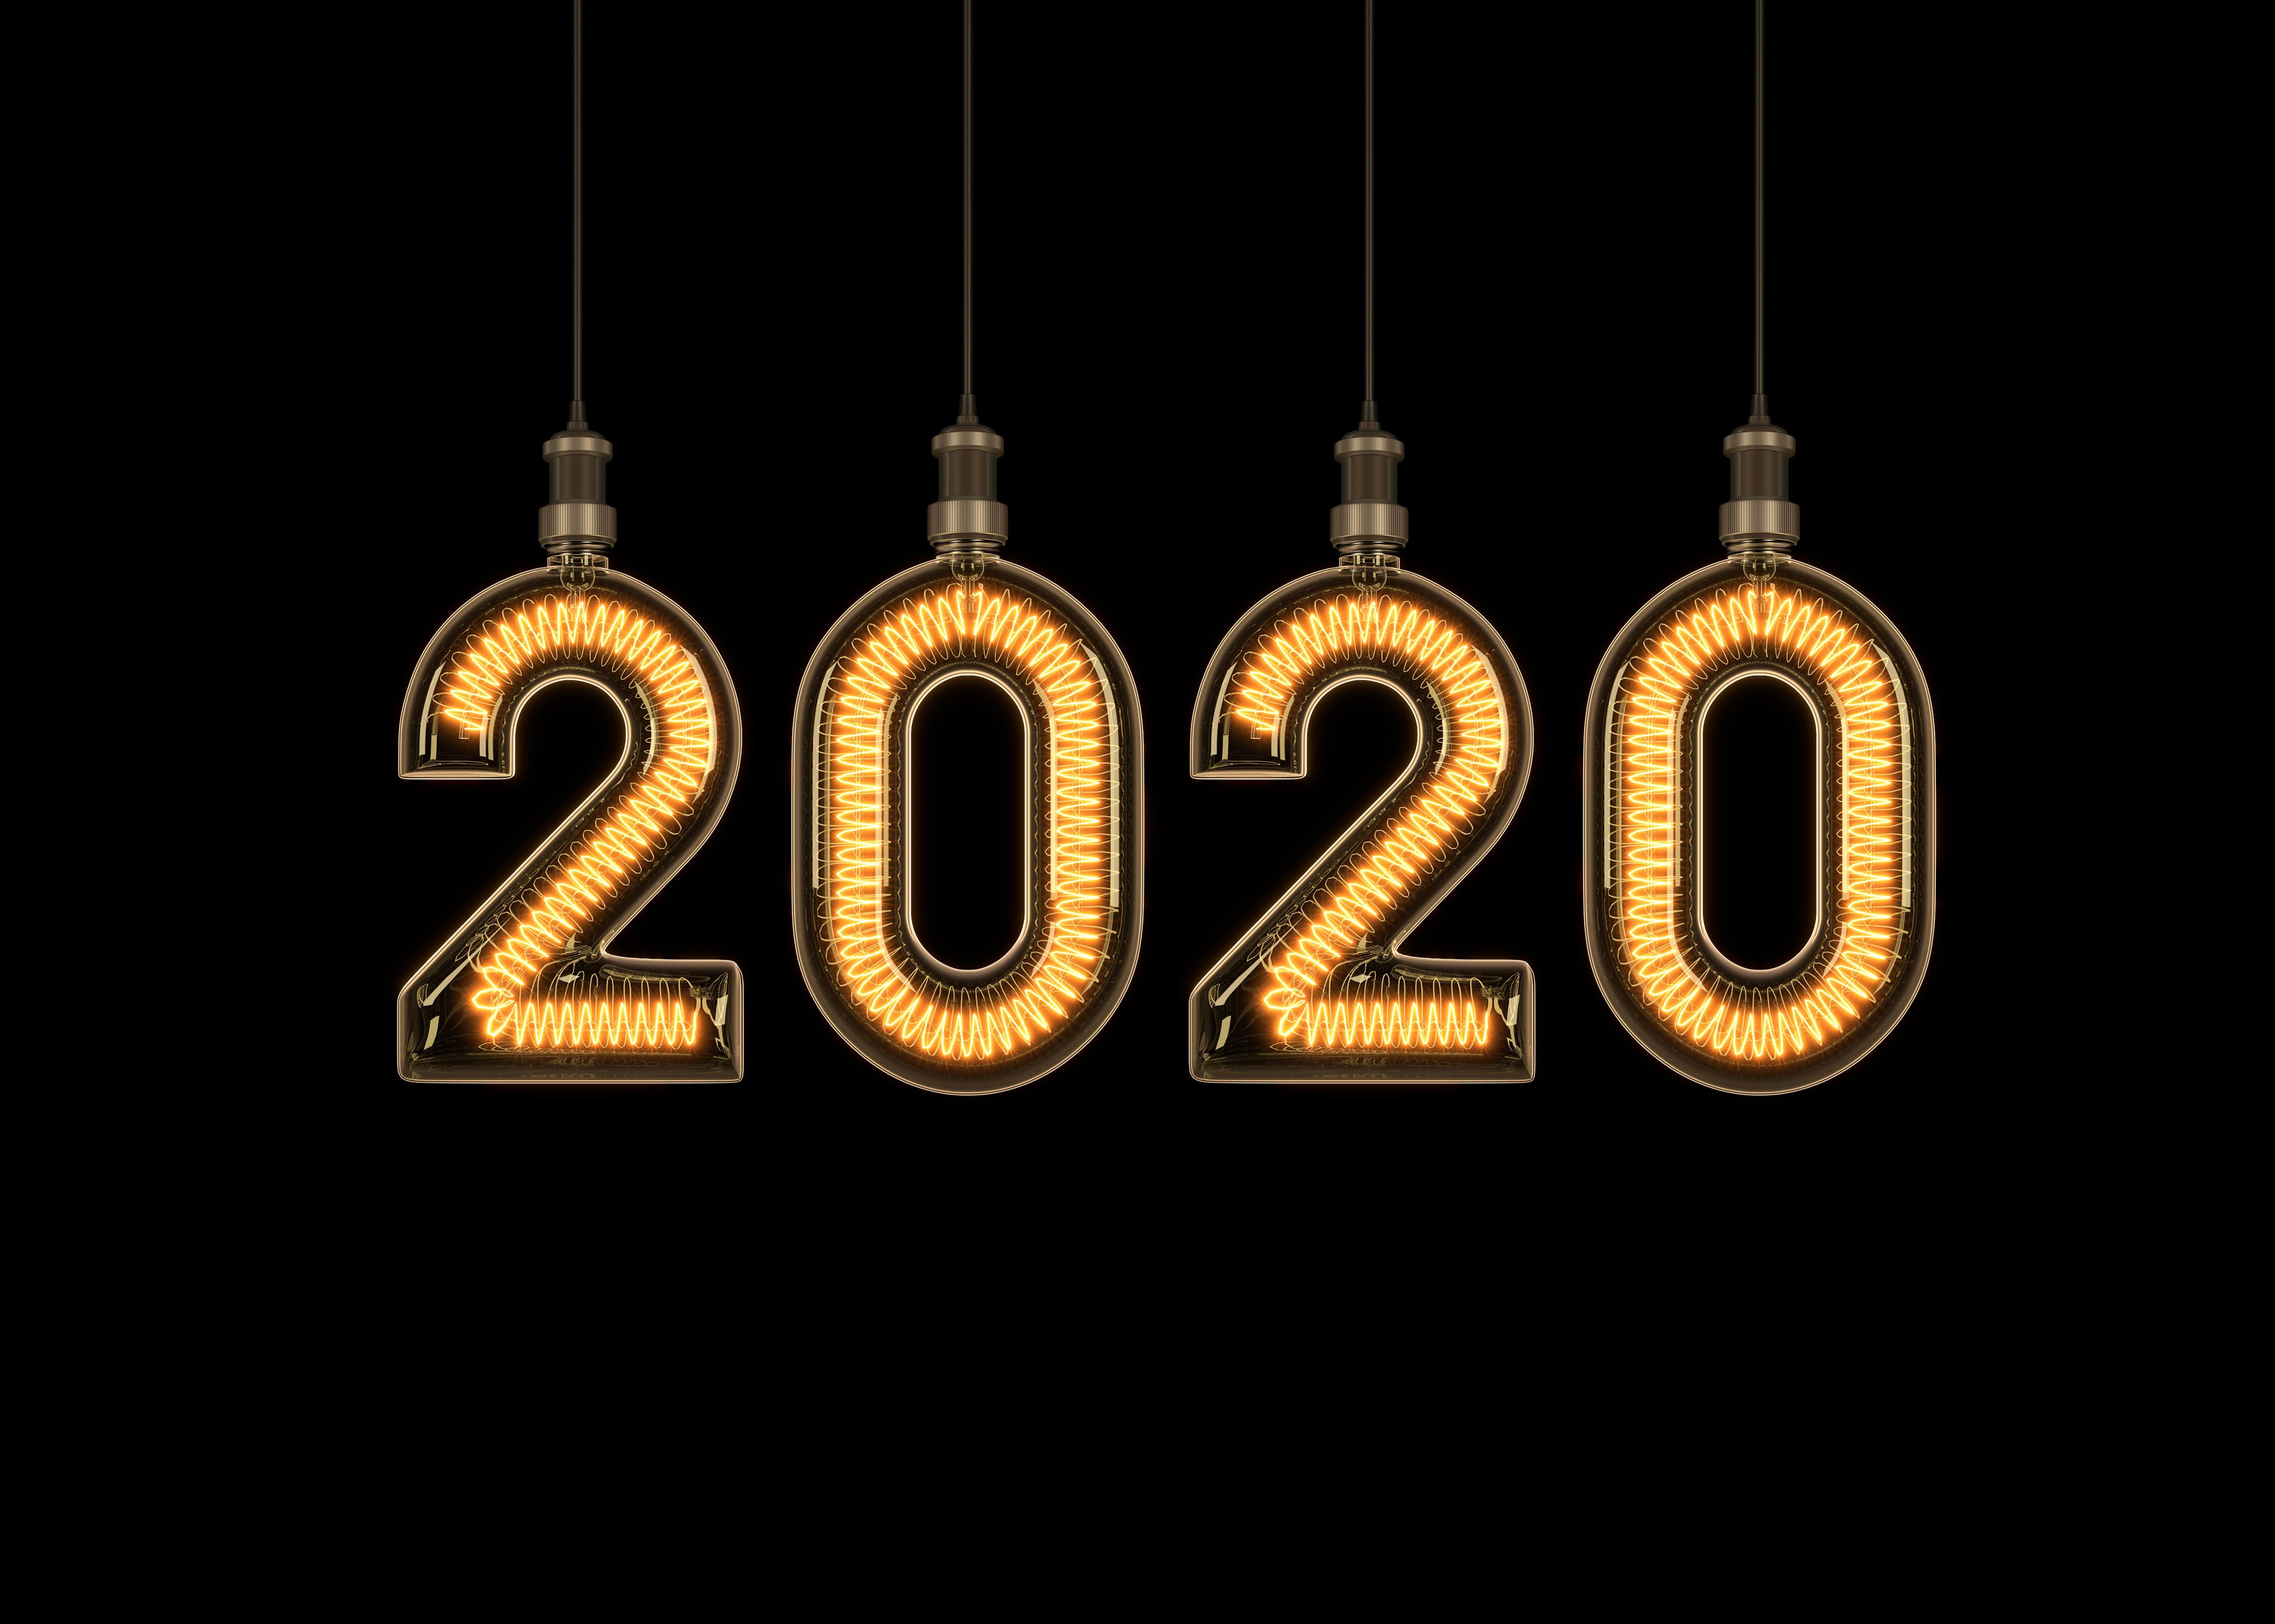 New Year 2020 4k Ultra HD Wallpaper Background Image 5000x3570 5000x3570